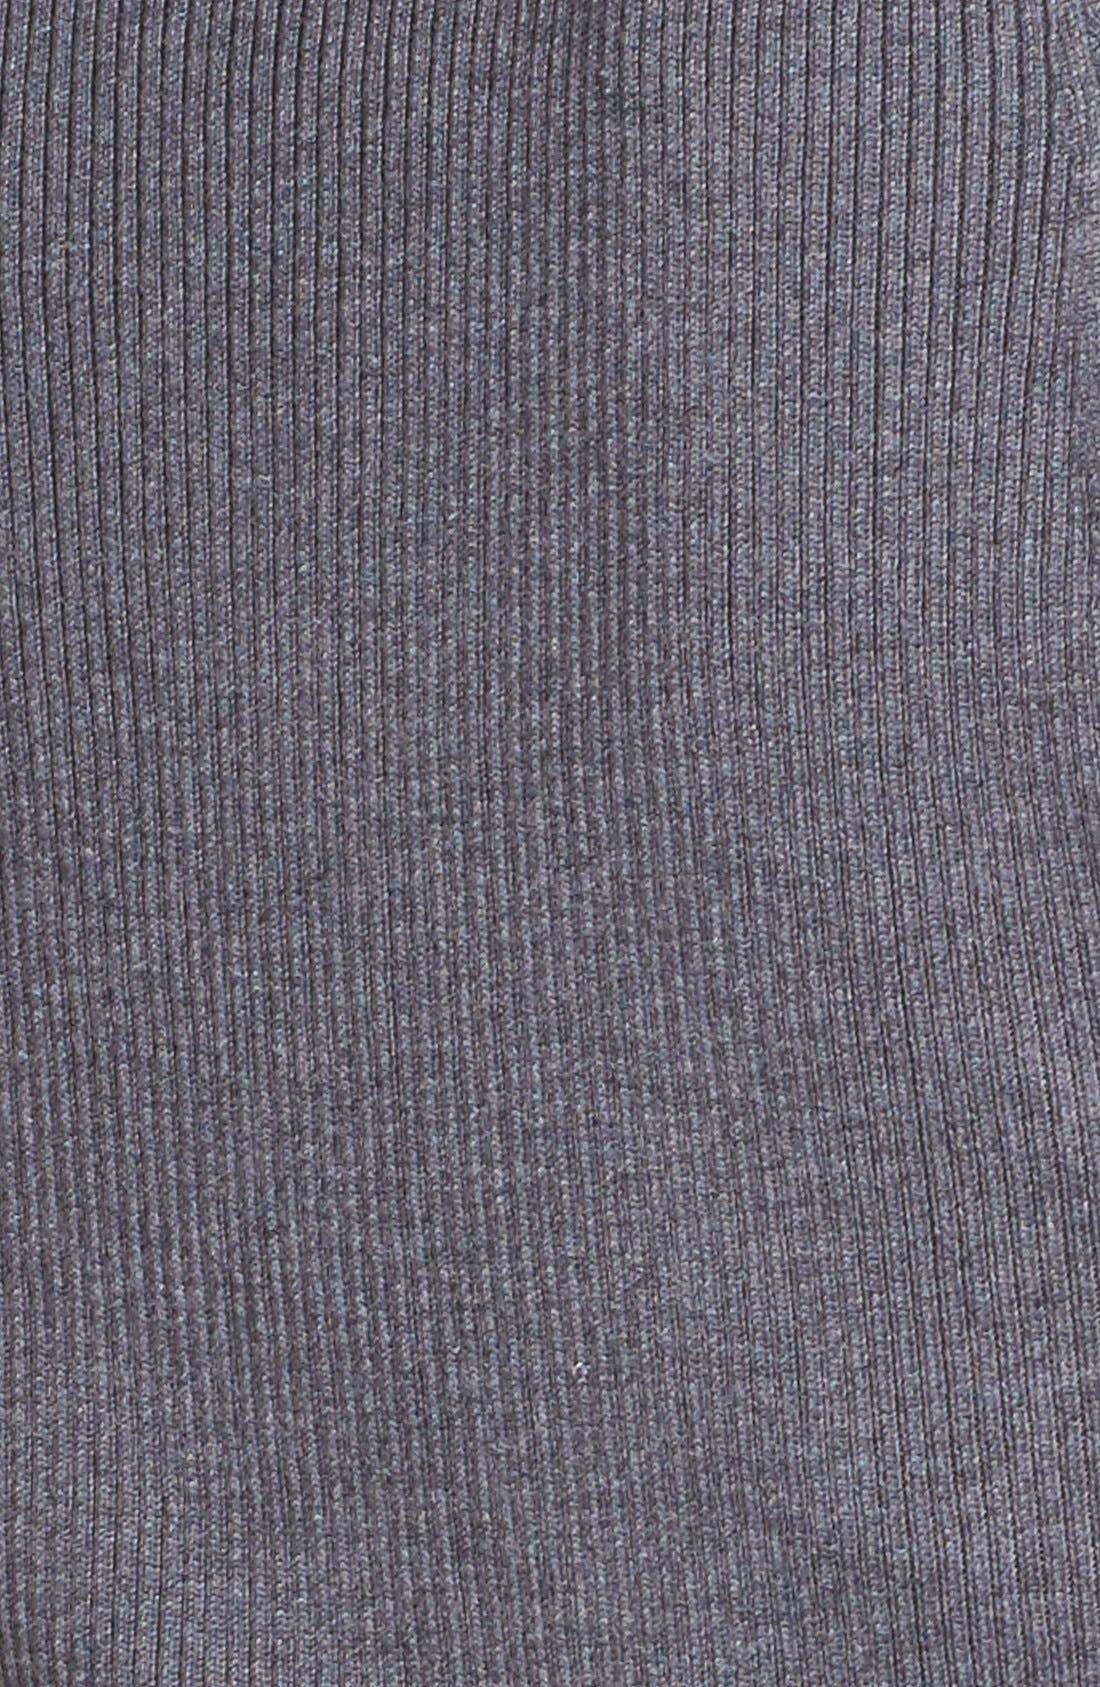 Alternate Image 3  - Vince Camuto Mock Neck Sweater